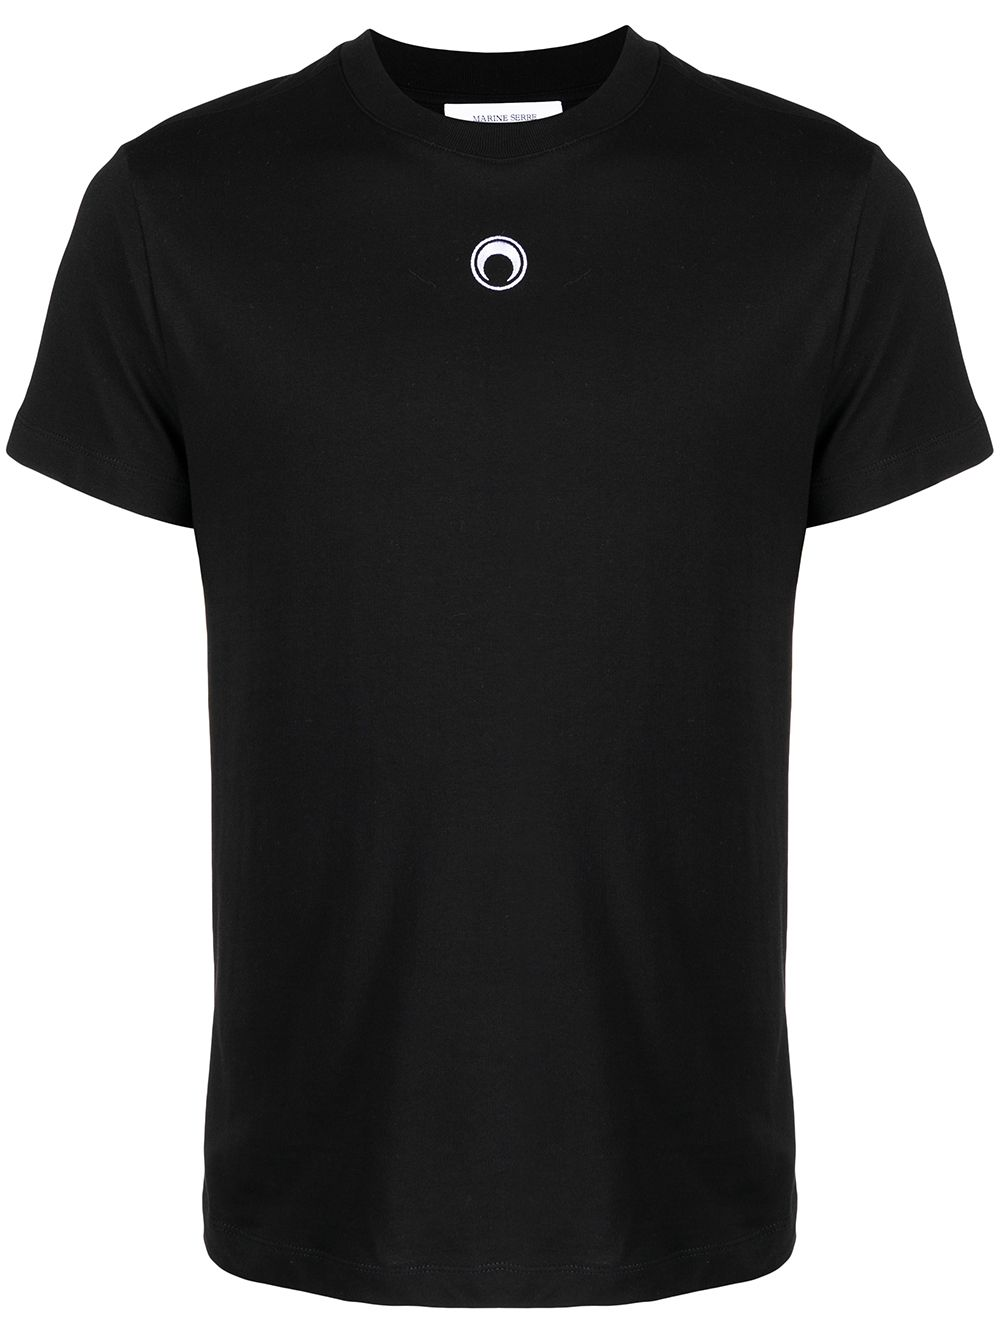 Marine Serre t-shirt moon logo uomo MARINE SERRE | T-shirt | T035ICONM-JERCO00200